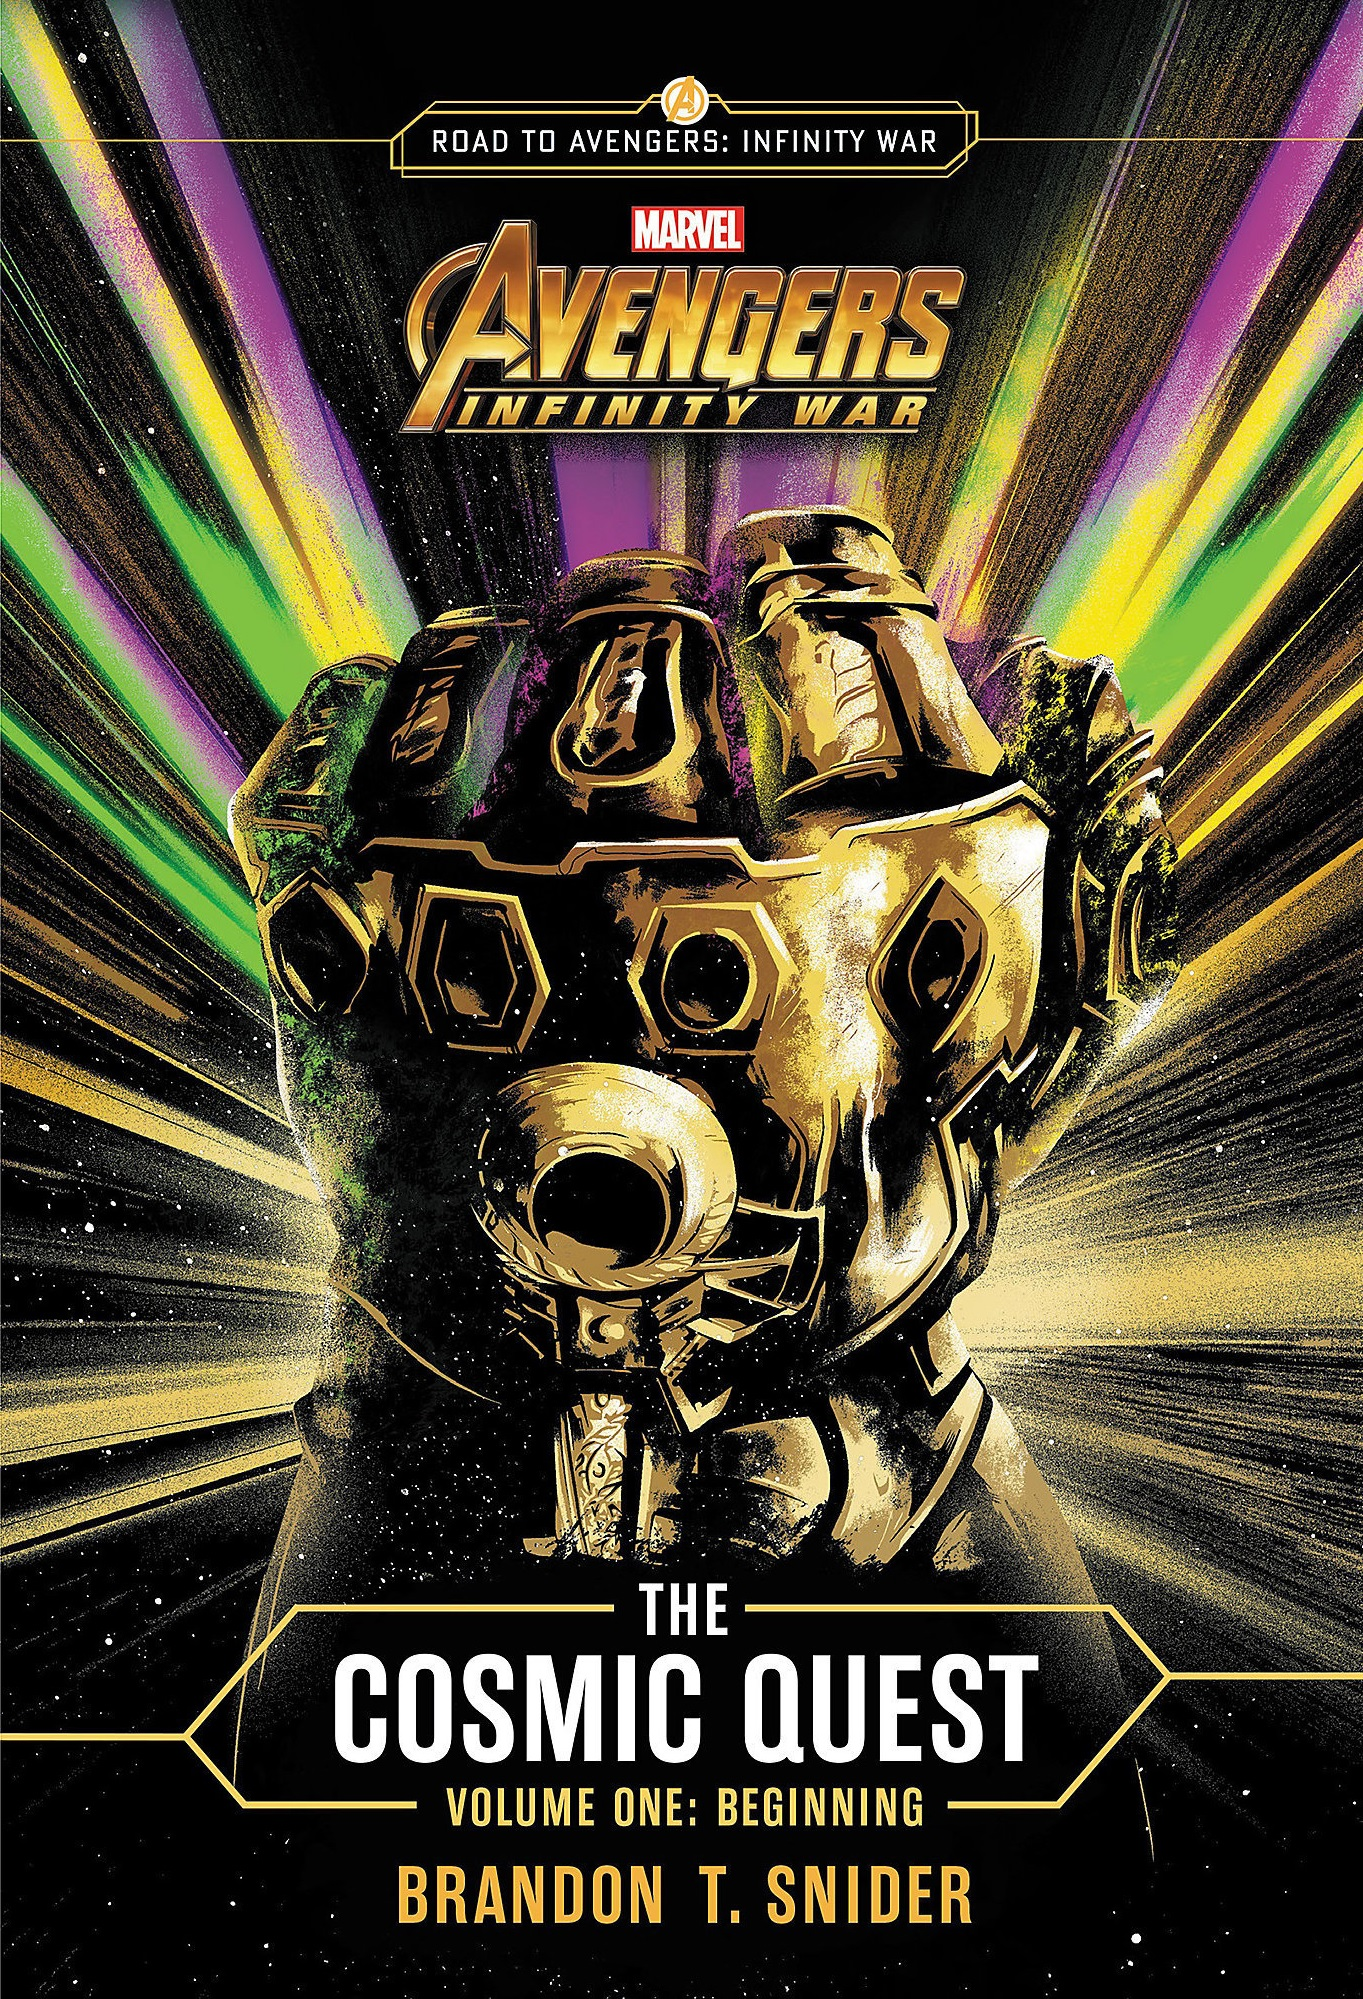 Marvel's Avengers: Infinity War: The Cosmic Quest - Volume 1